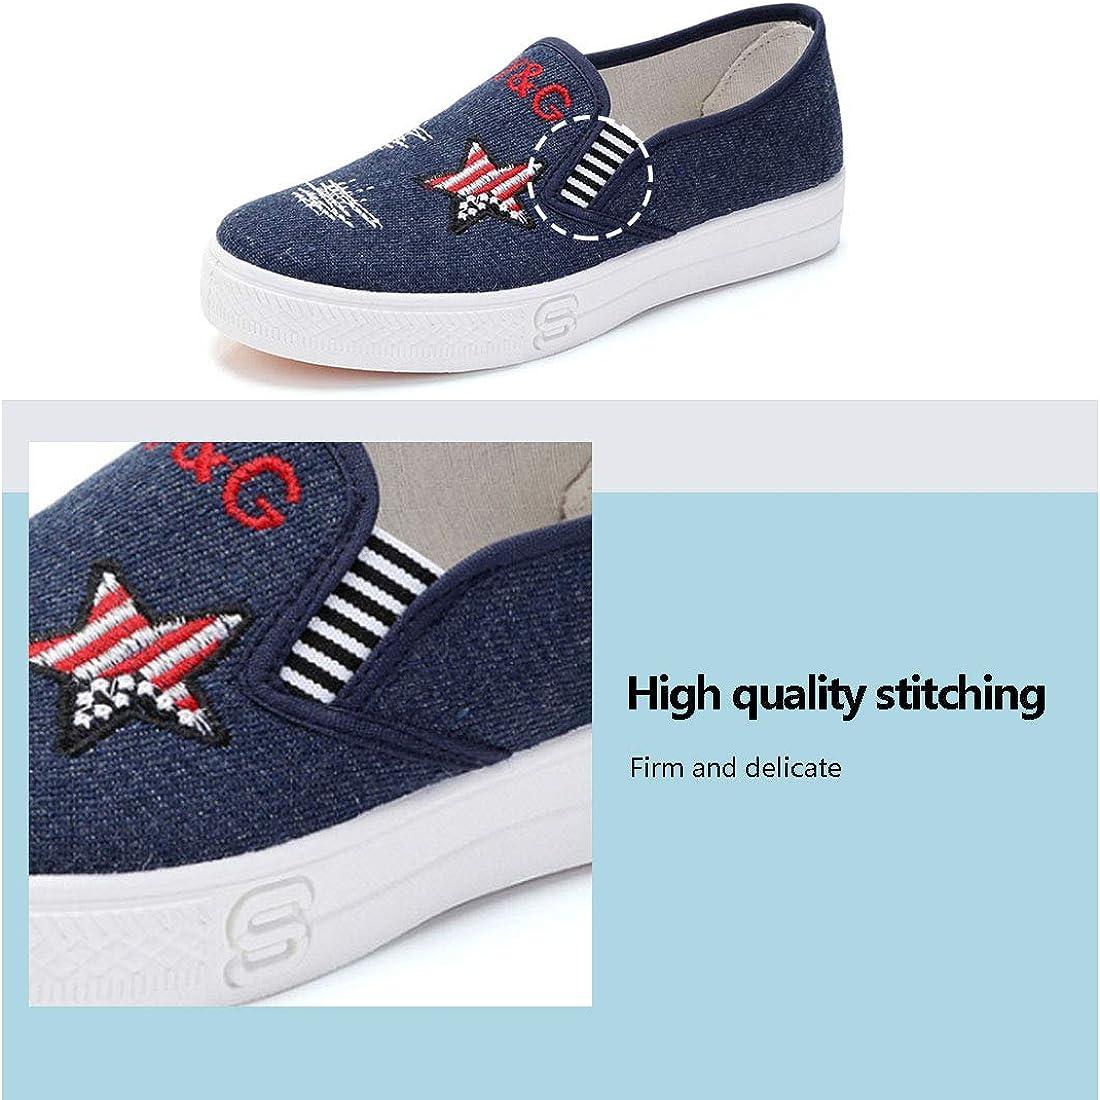 ZOSYNS Zapatos de lona para mujer 40 zapatos para mujer zapatos para el aire libre 35 zapatos con tac/ón alto zapatos para exteriores zapatos de lona